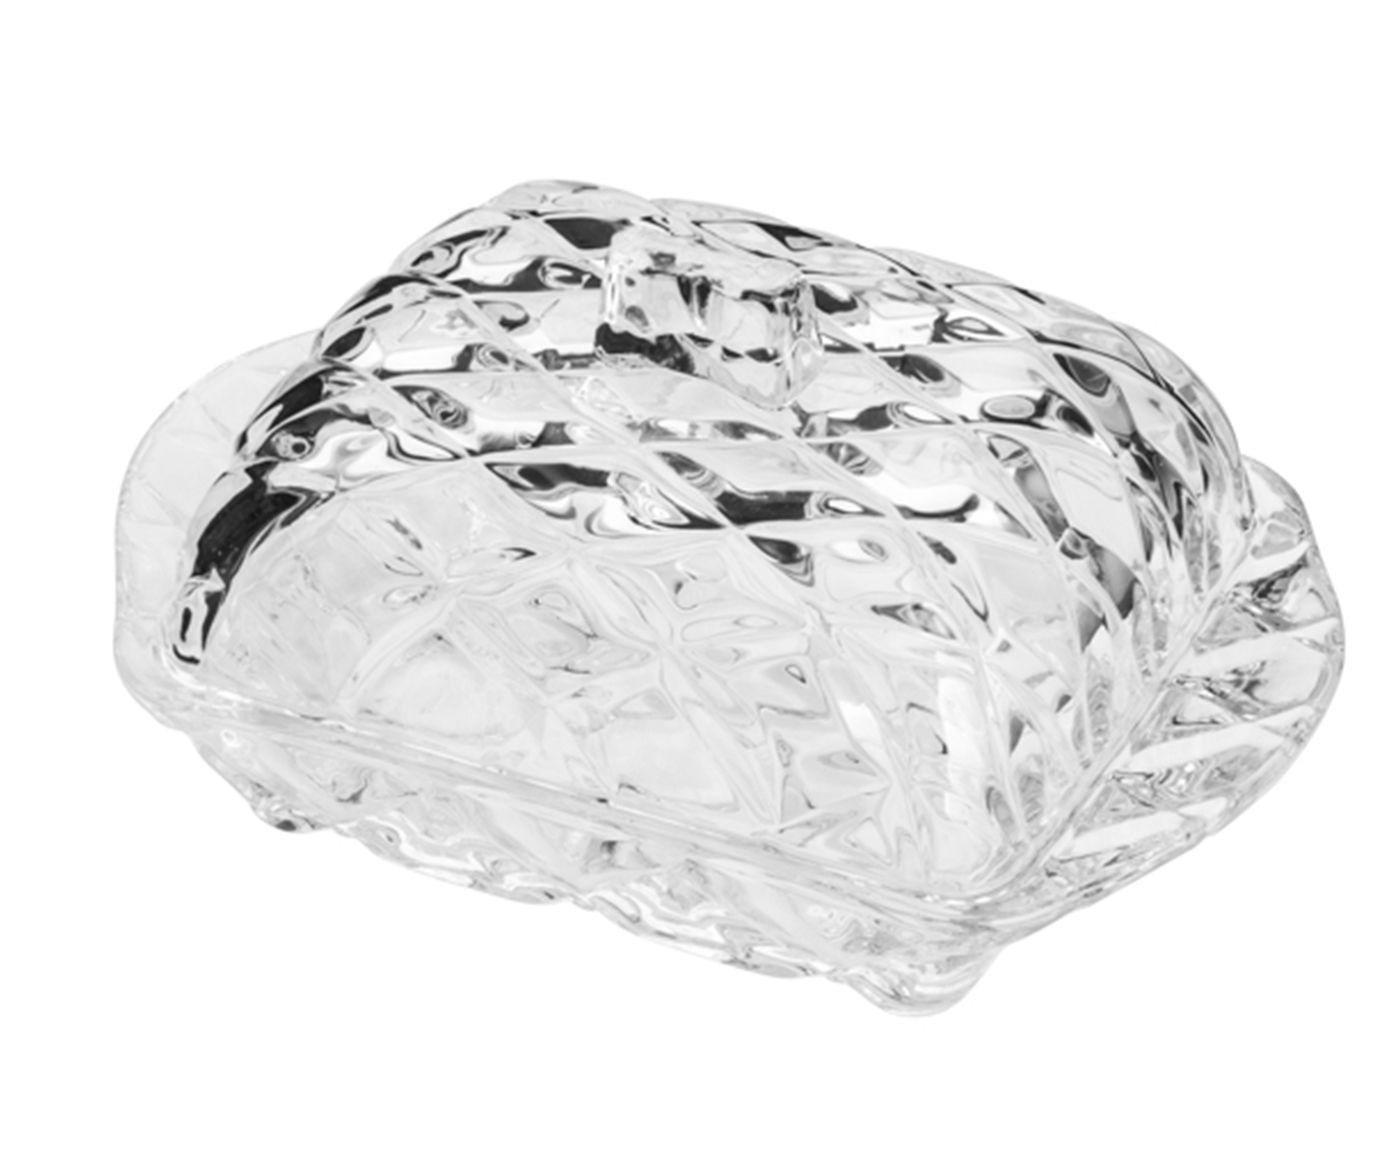 Mantegueira em Cristal Deli - 16,9X10X8cm | Westwing.com.br